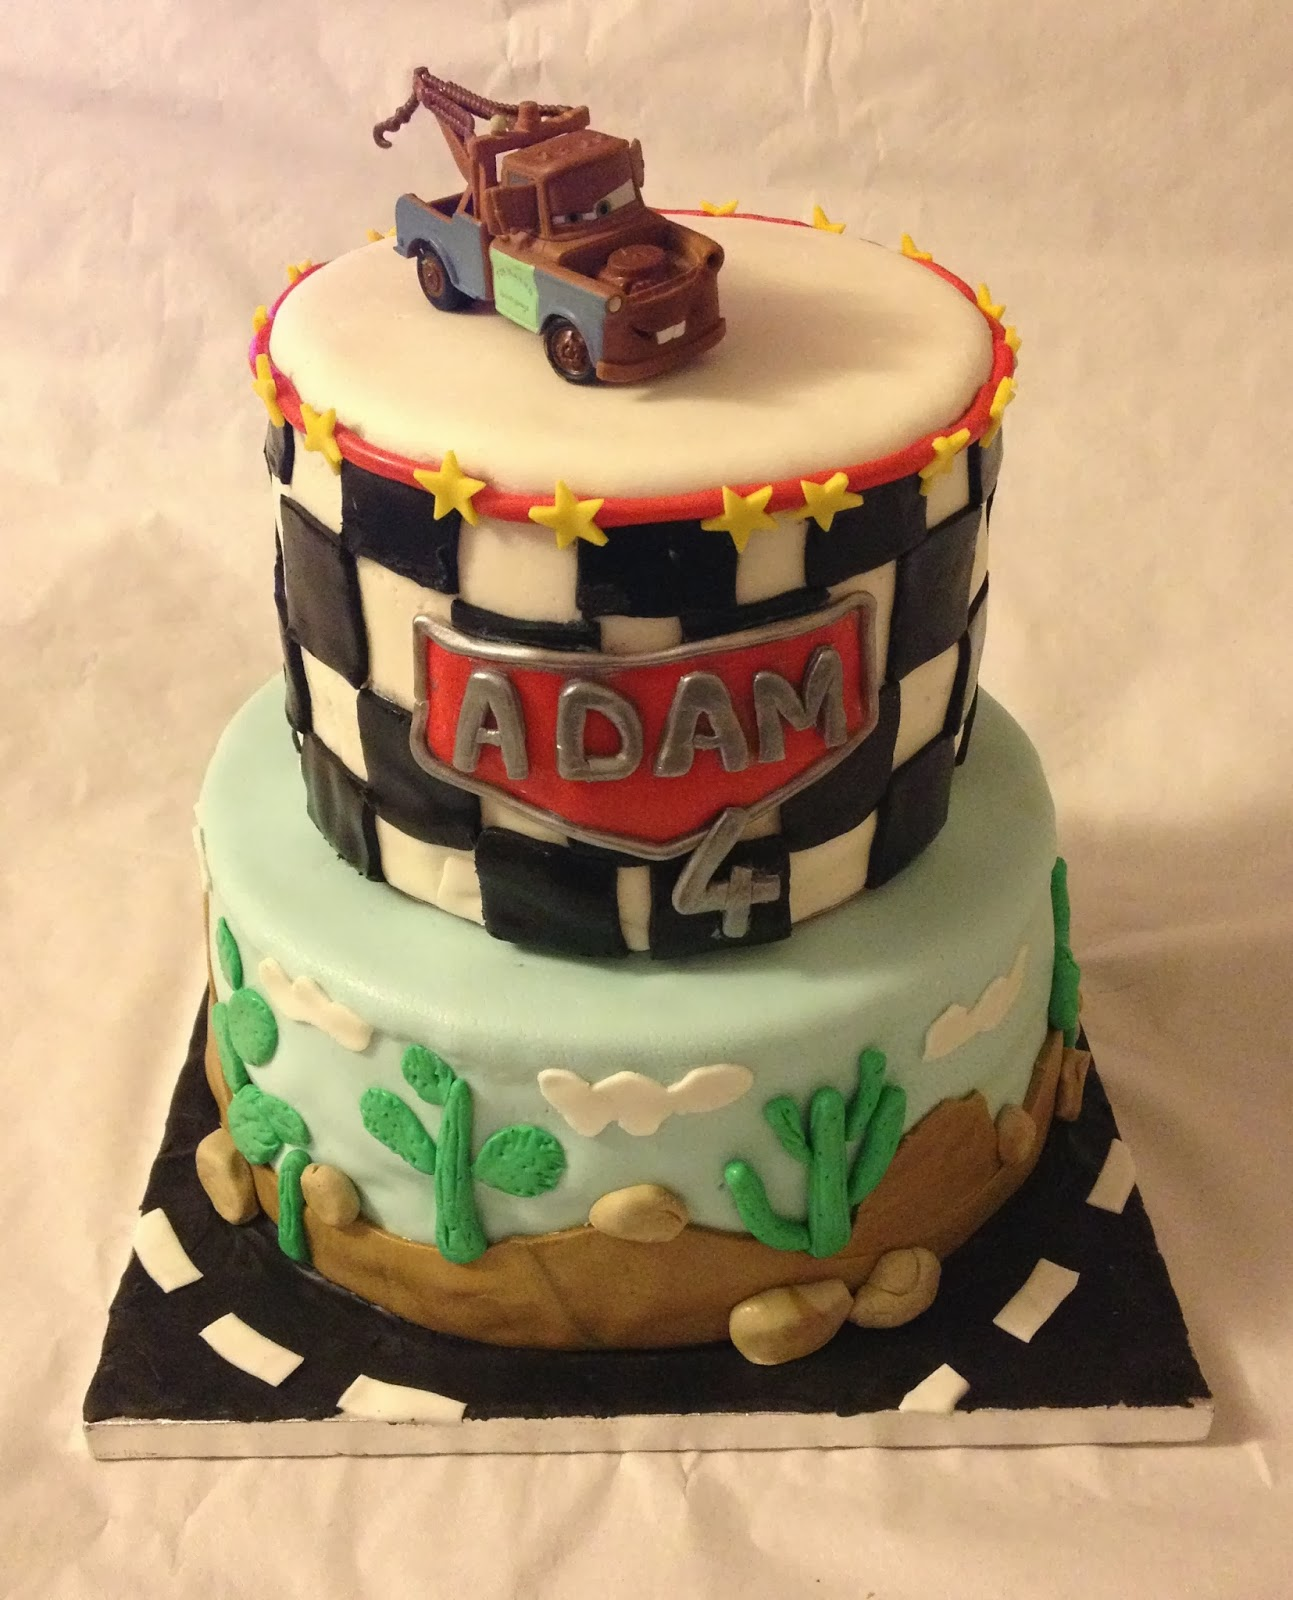 Lona S Cake Incontournable Cars